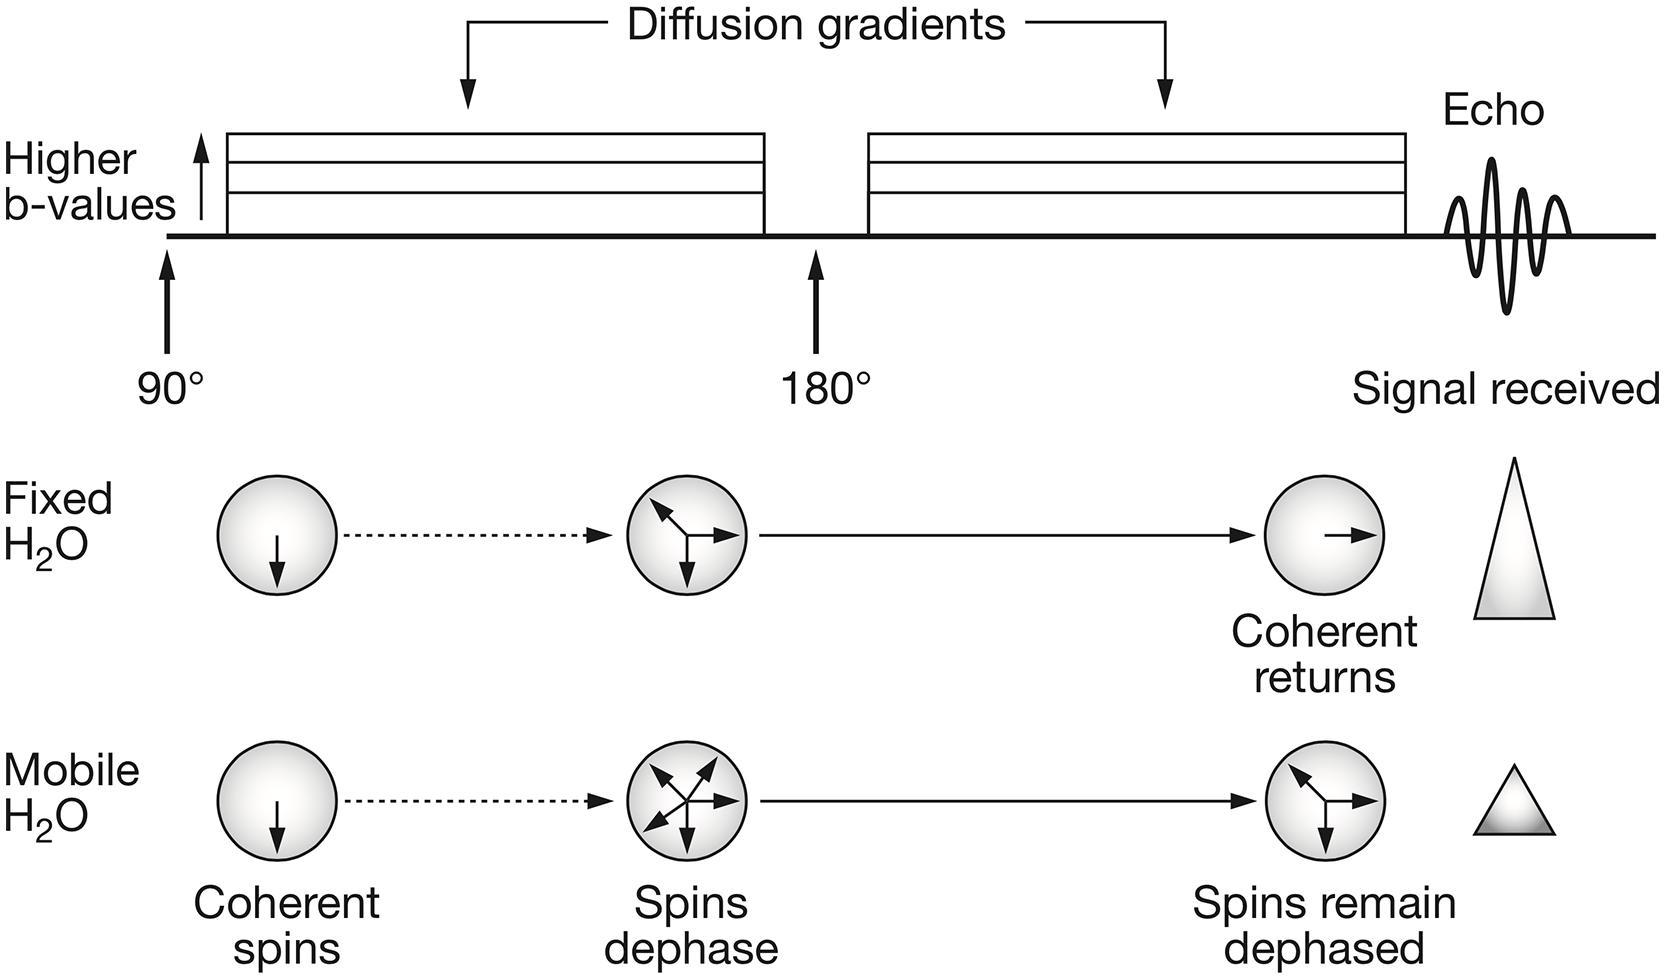 Rgb Wiring Diagram Mri - Trusted Wiring Diagrams •